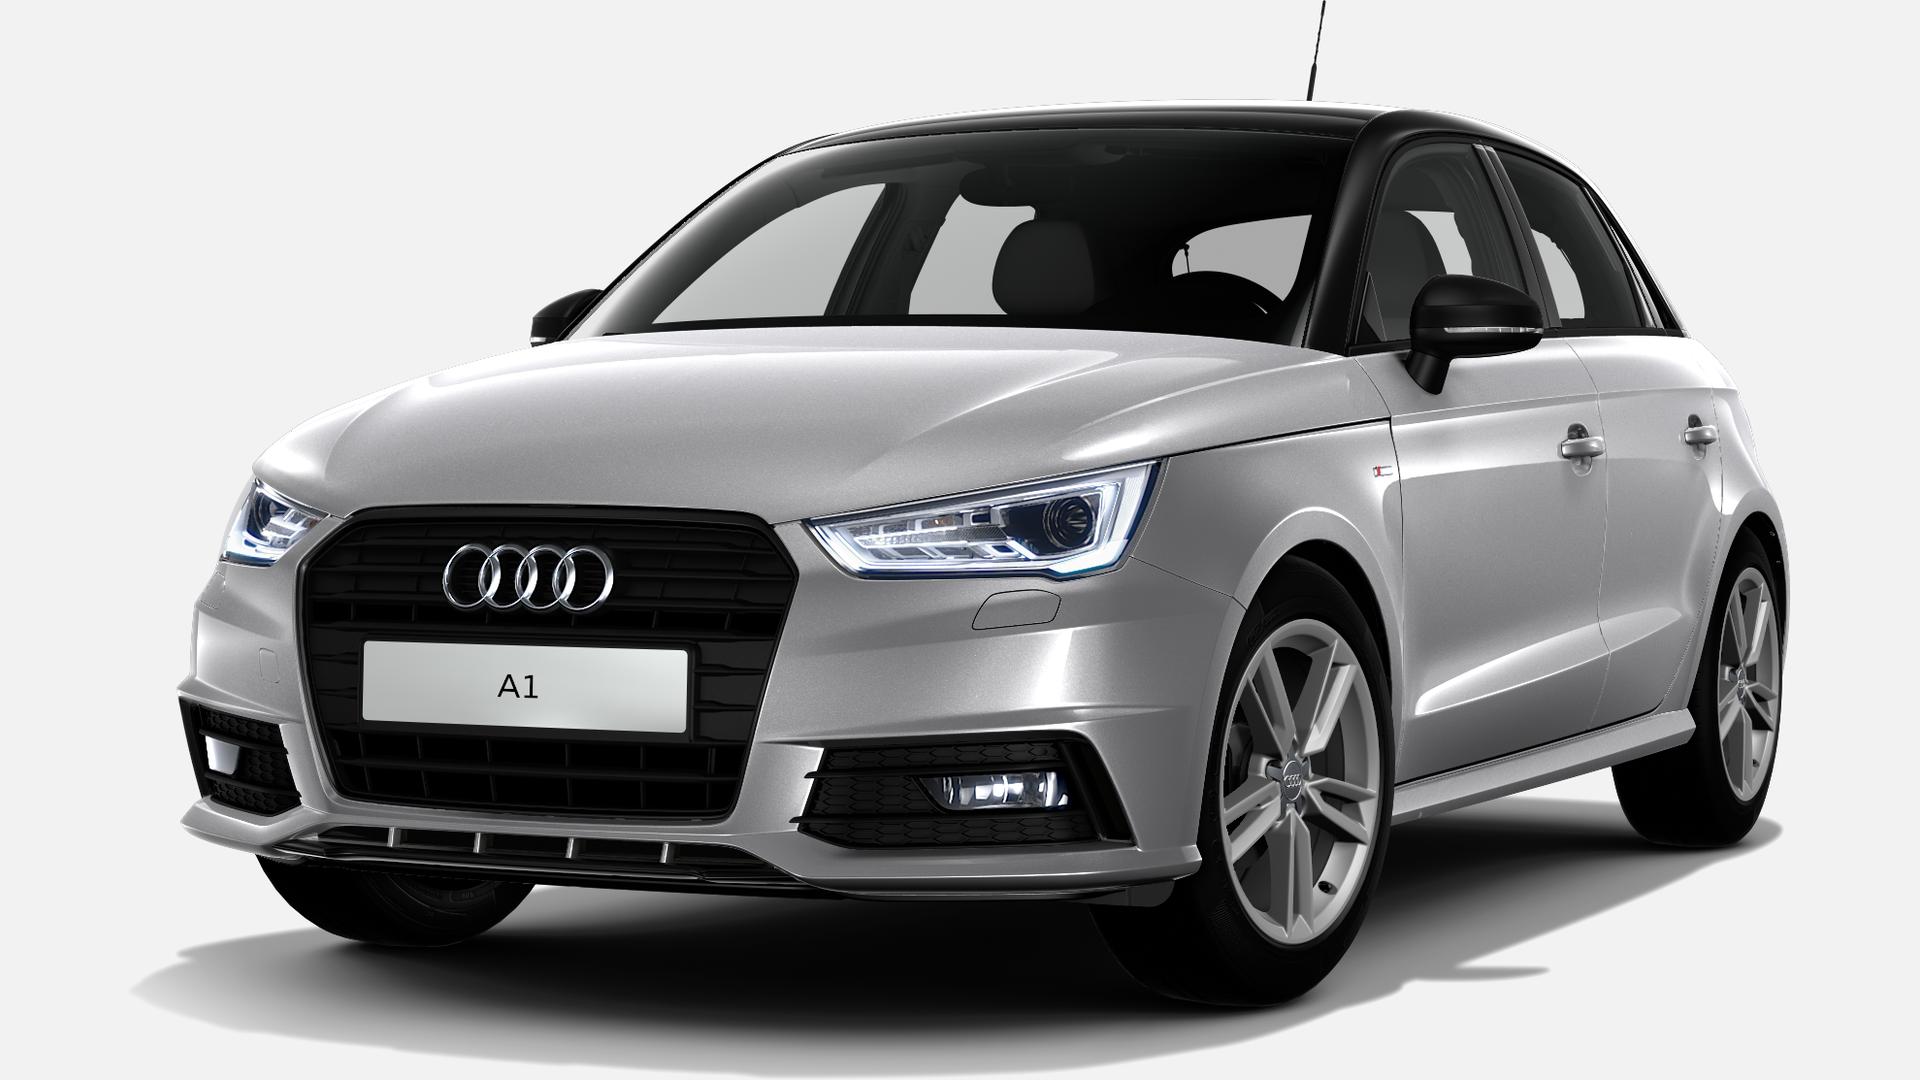 Audi A1 Sportback 1.4 TFSI Adrenalin 92 kW (125 CV)